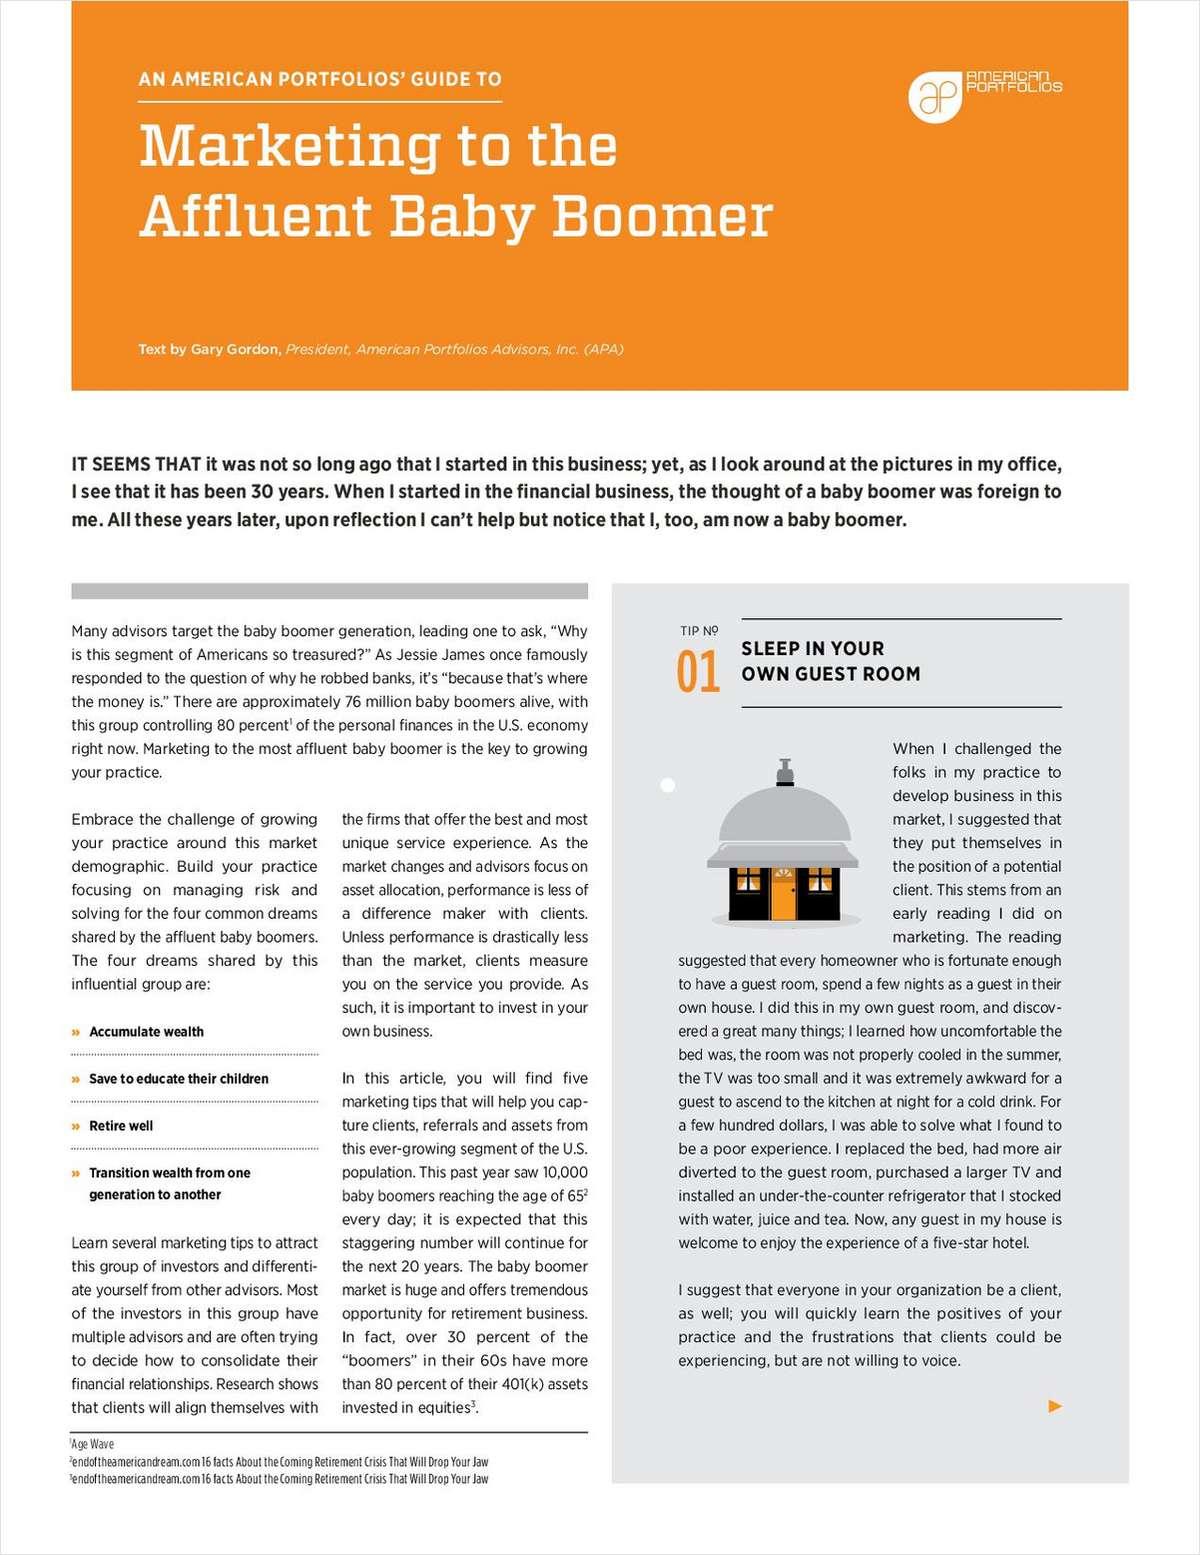 Marketing to the Affluent Baby Boomer